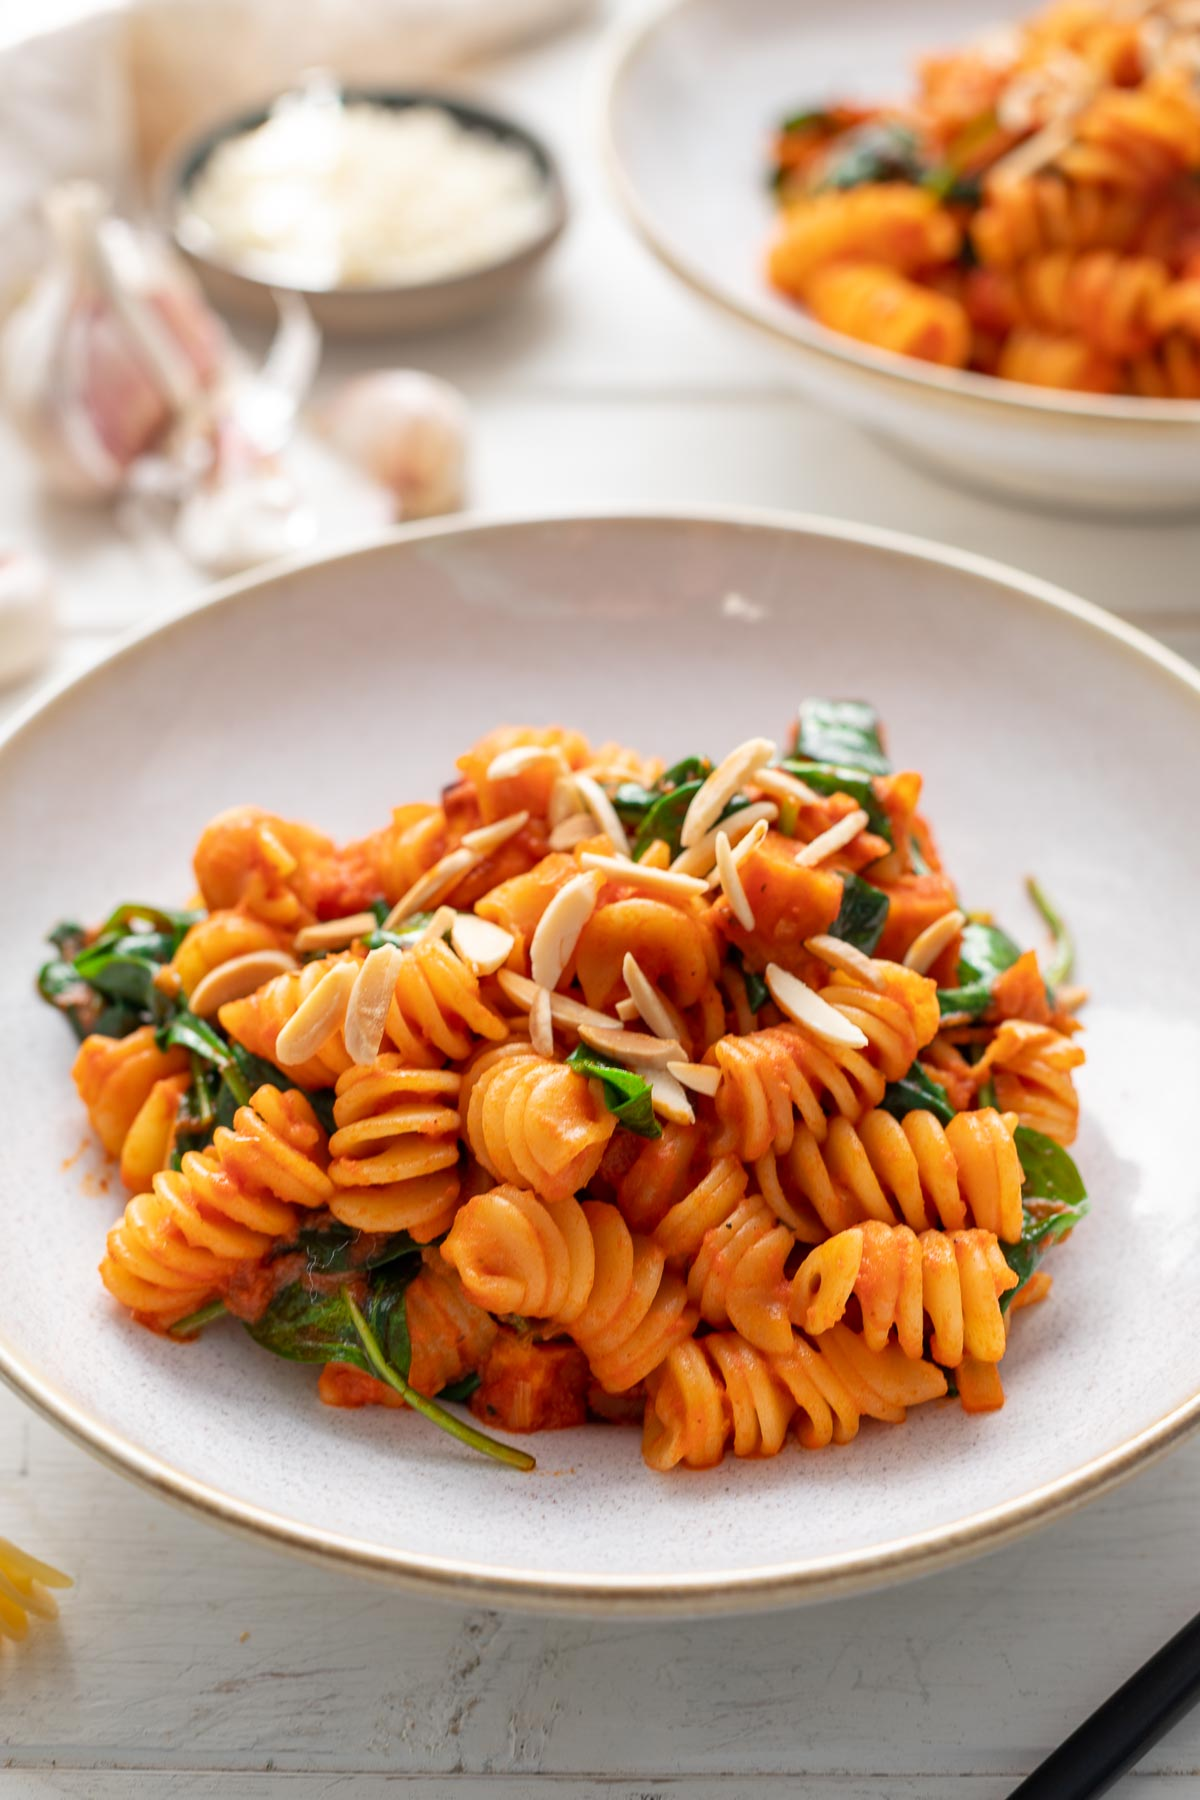 Spicy Tomato Sauce Pasta